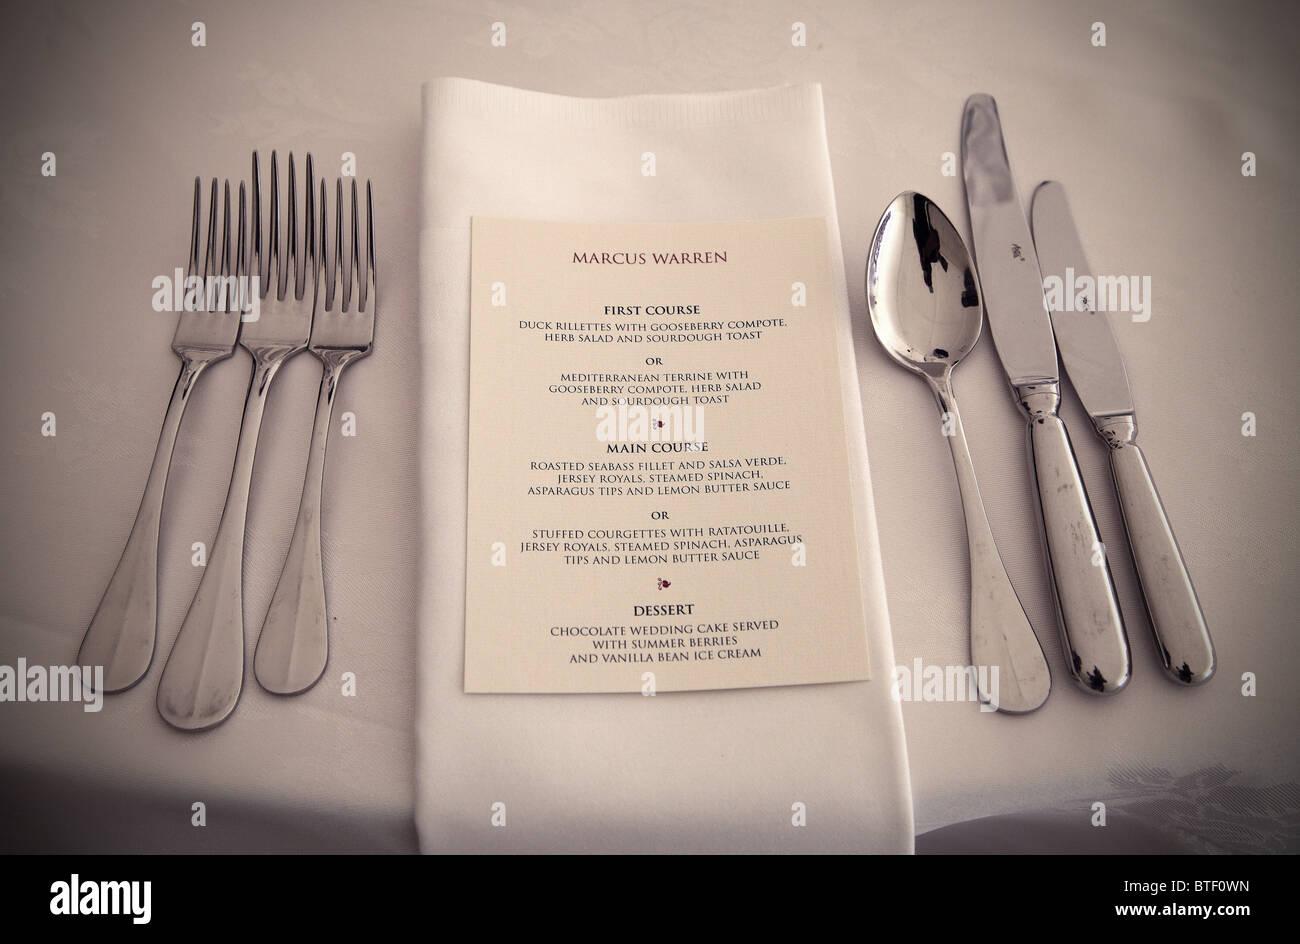 Wedding day menu - Stock Image